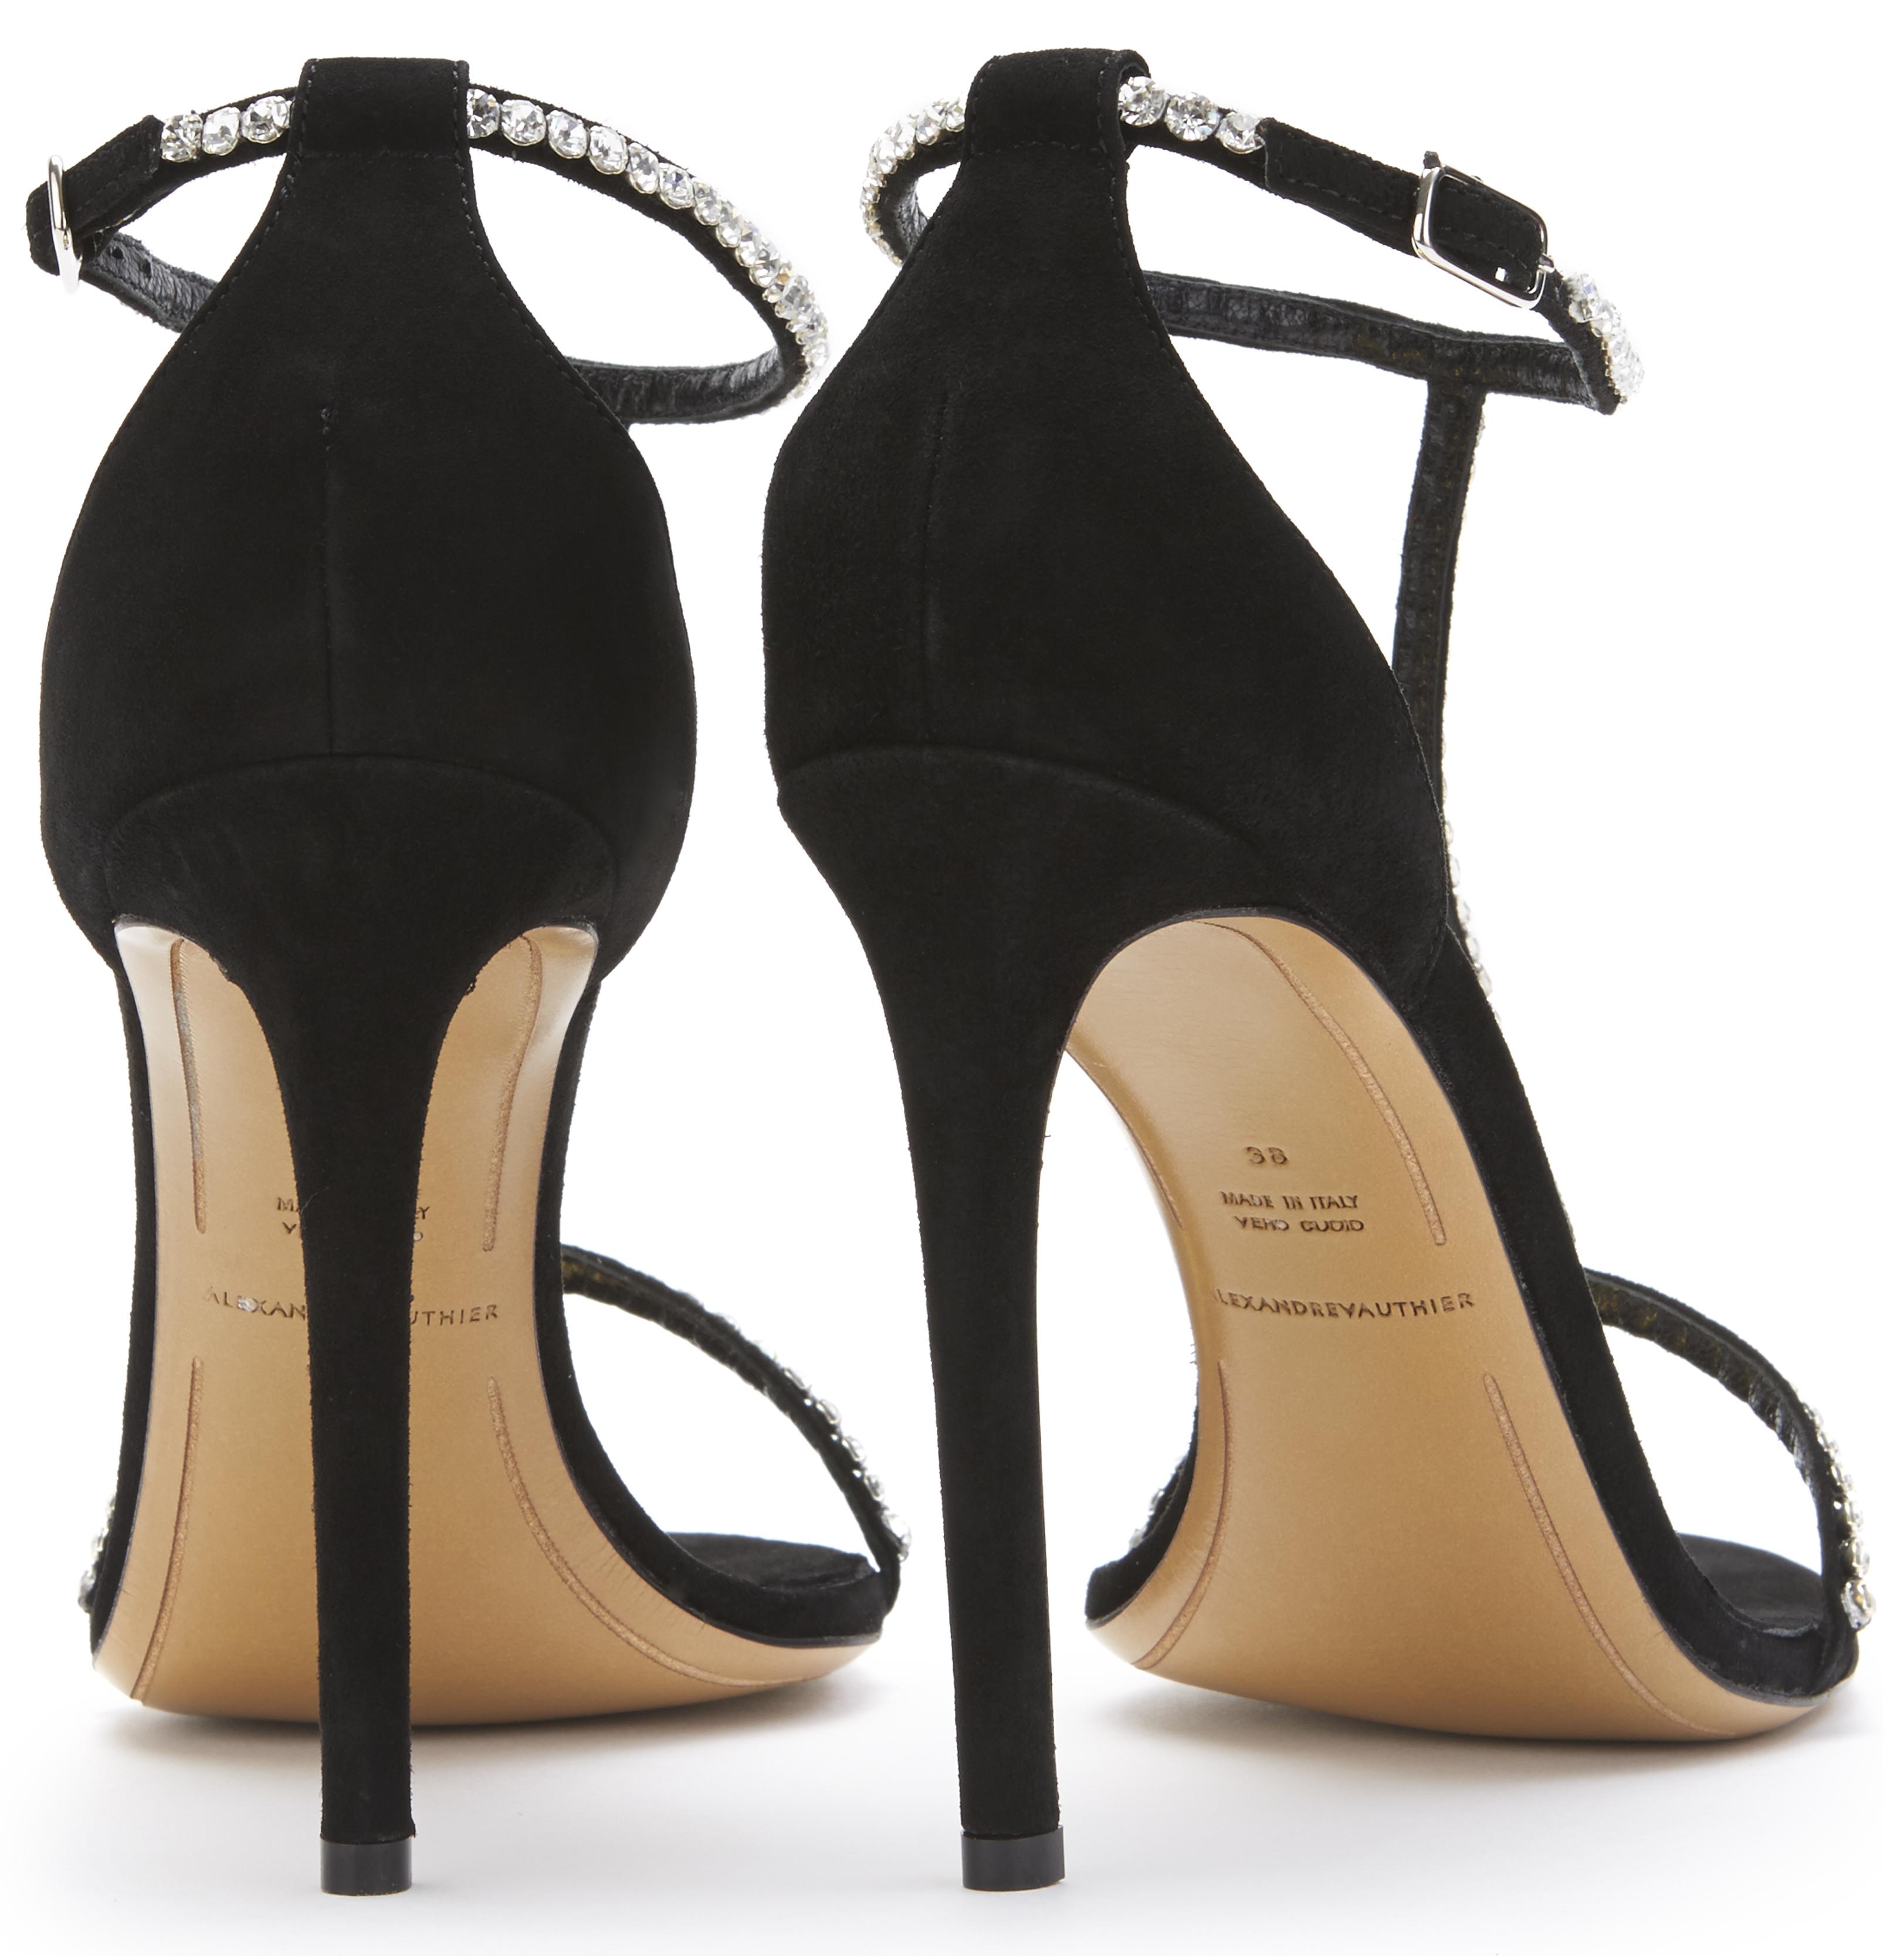 2a2b8e3b9560f ALEXANDRE VAUTHIER – Swarovski™ T-Bar stiletto sandal in black suede ...